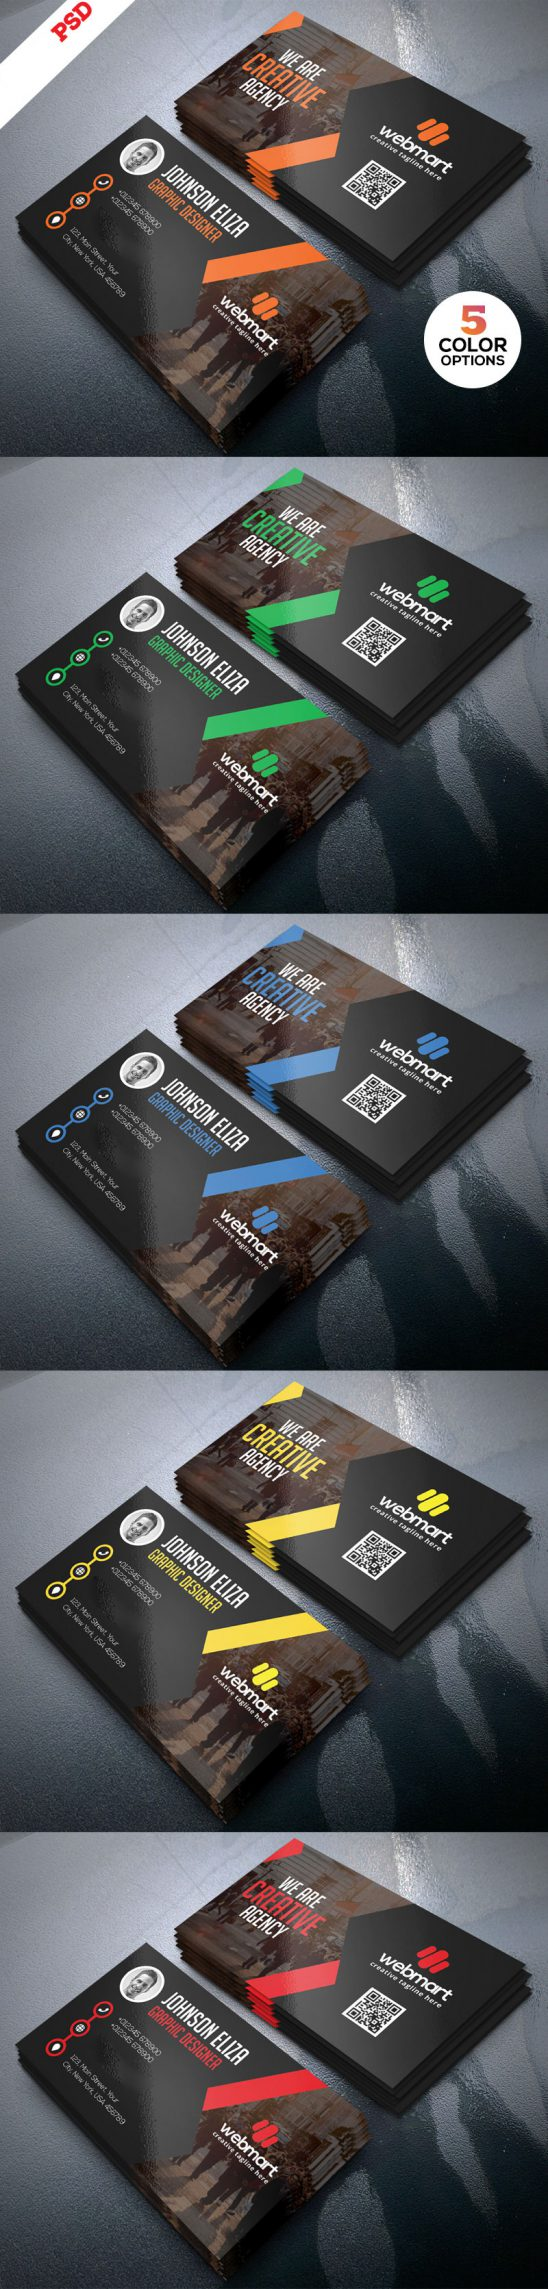 p679 548x2289 - لایه باز کارت ویزیت تجاری اداری با قابلیت درج عکس پرسنلی و qrcod